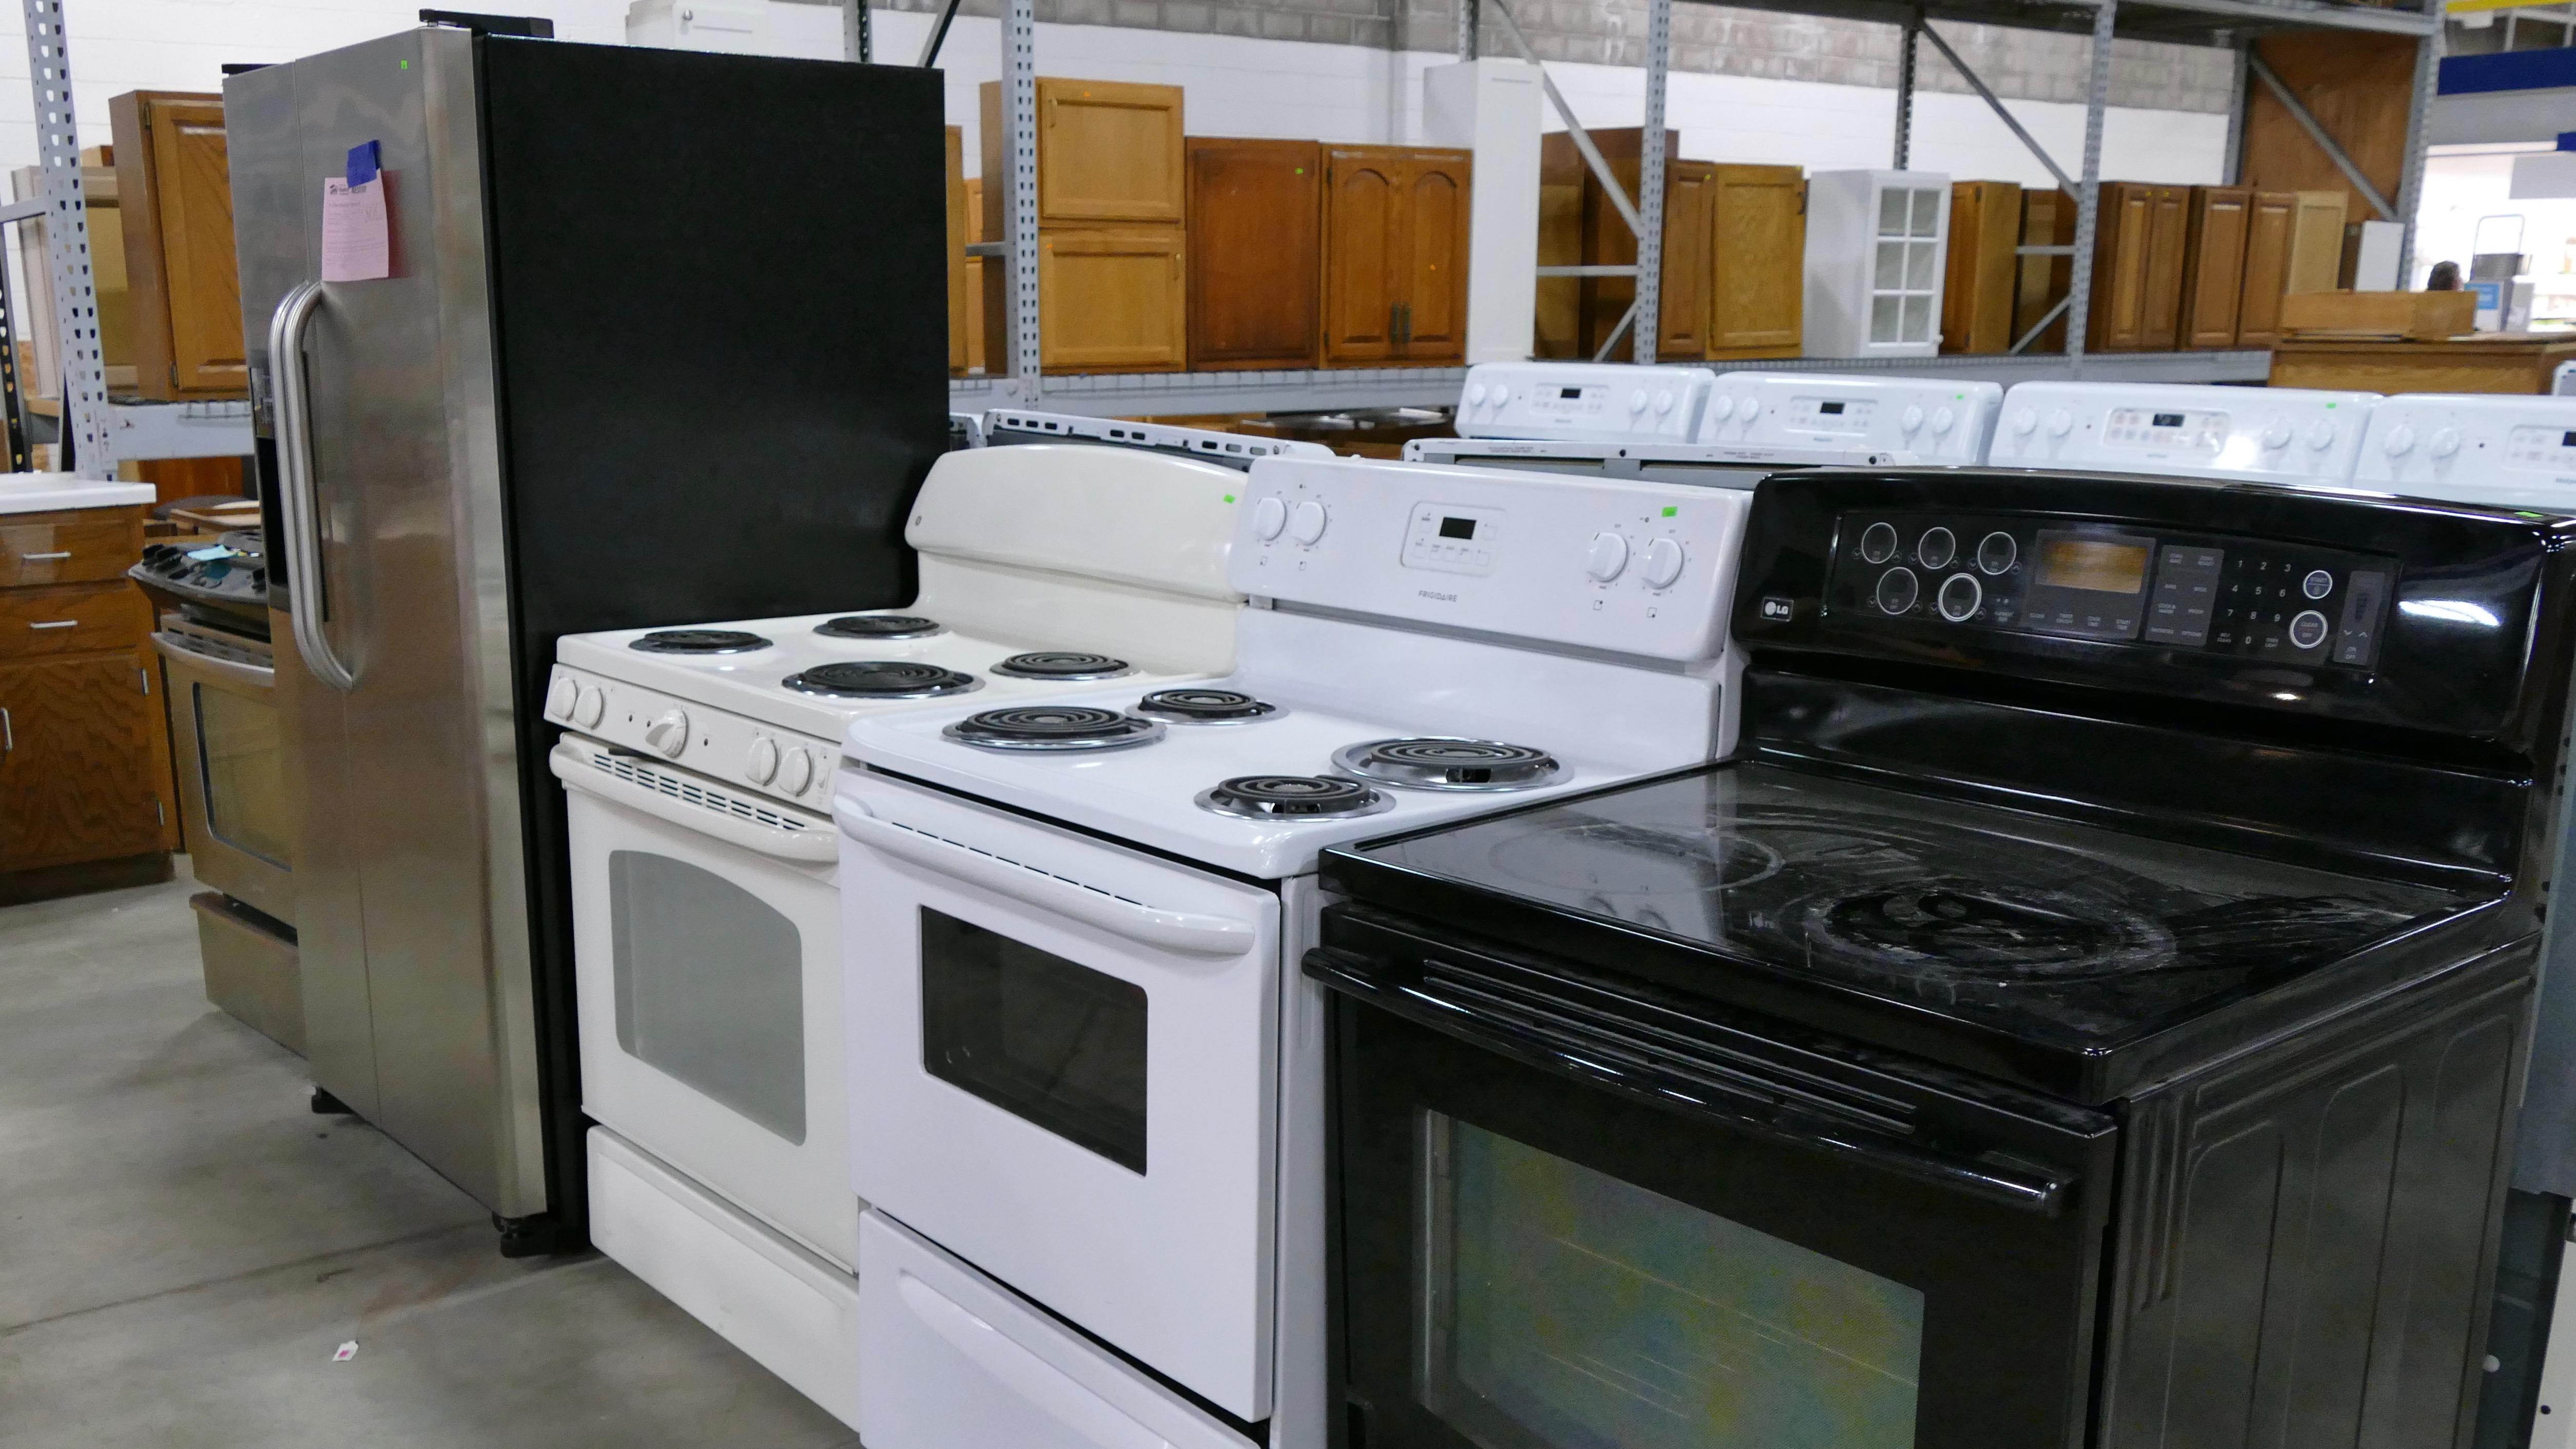 Appliances at the Minneapolis ReStore